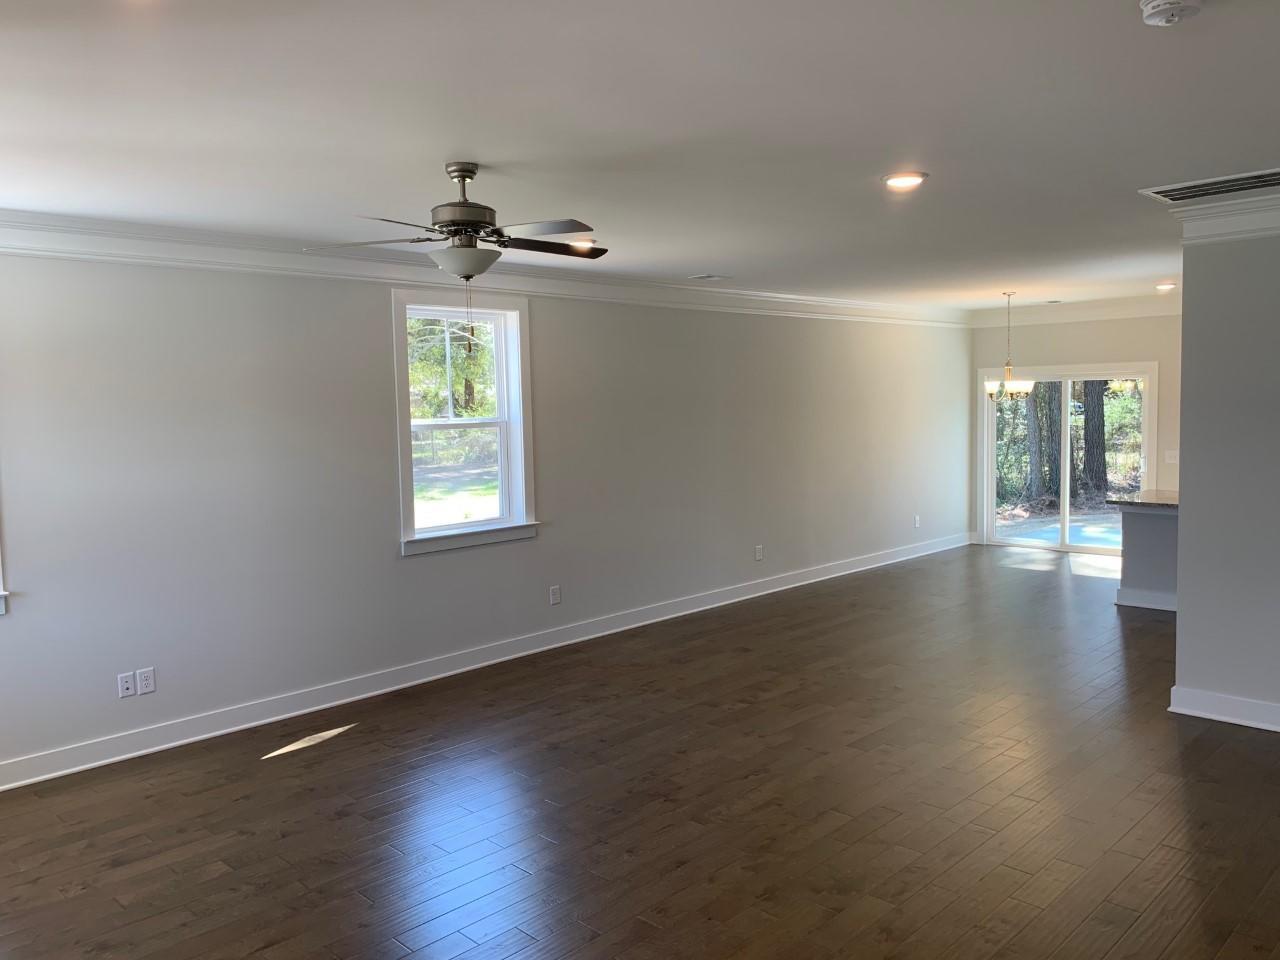 None Homes For Sale - 1111 Lieben, Mount Pleasant, SC - 8